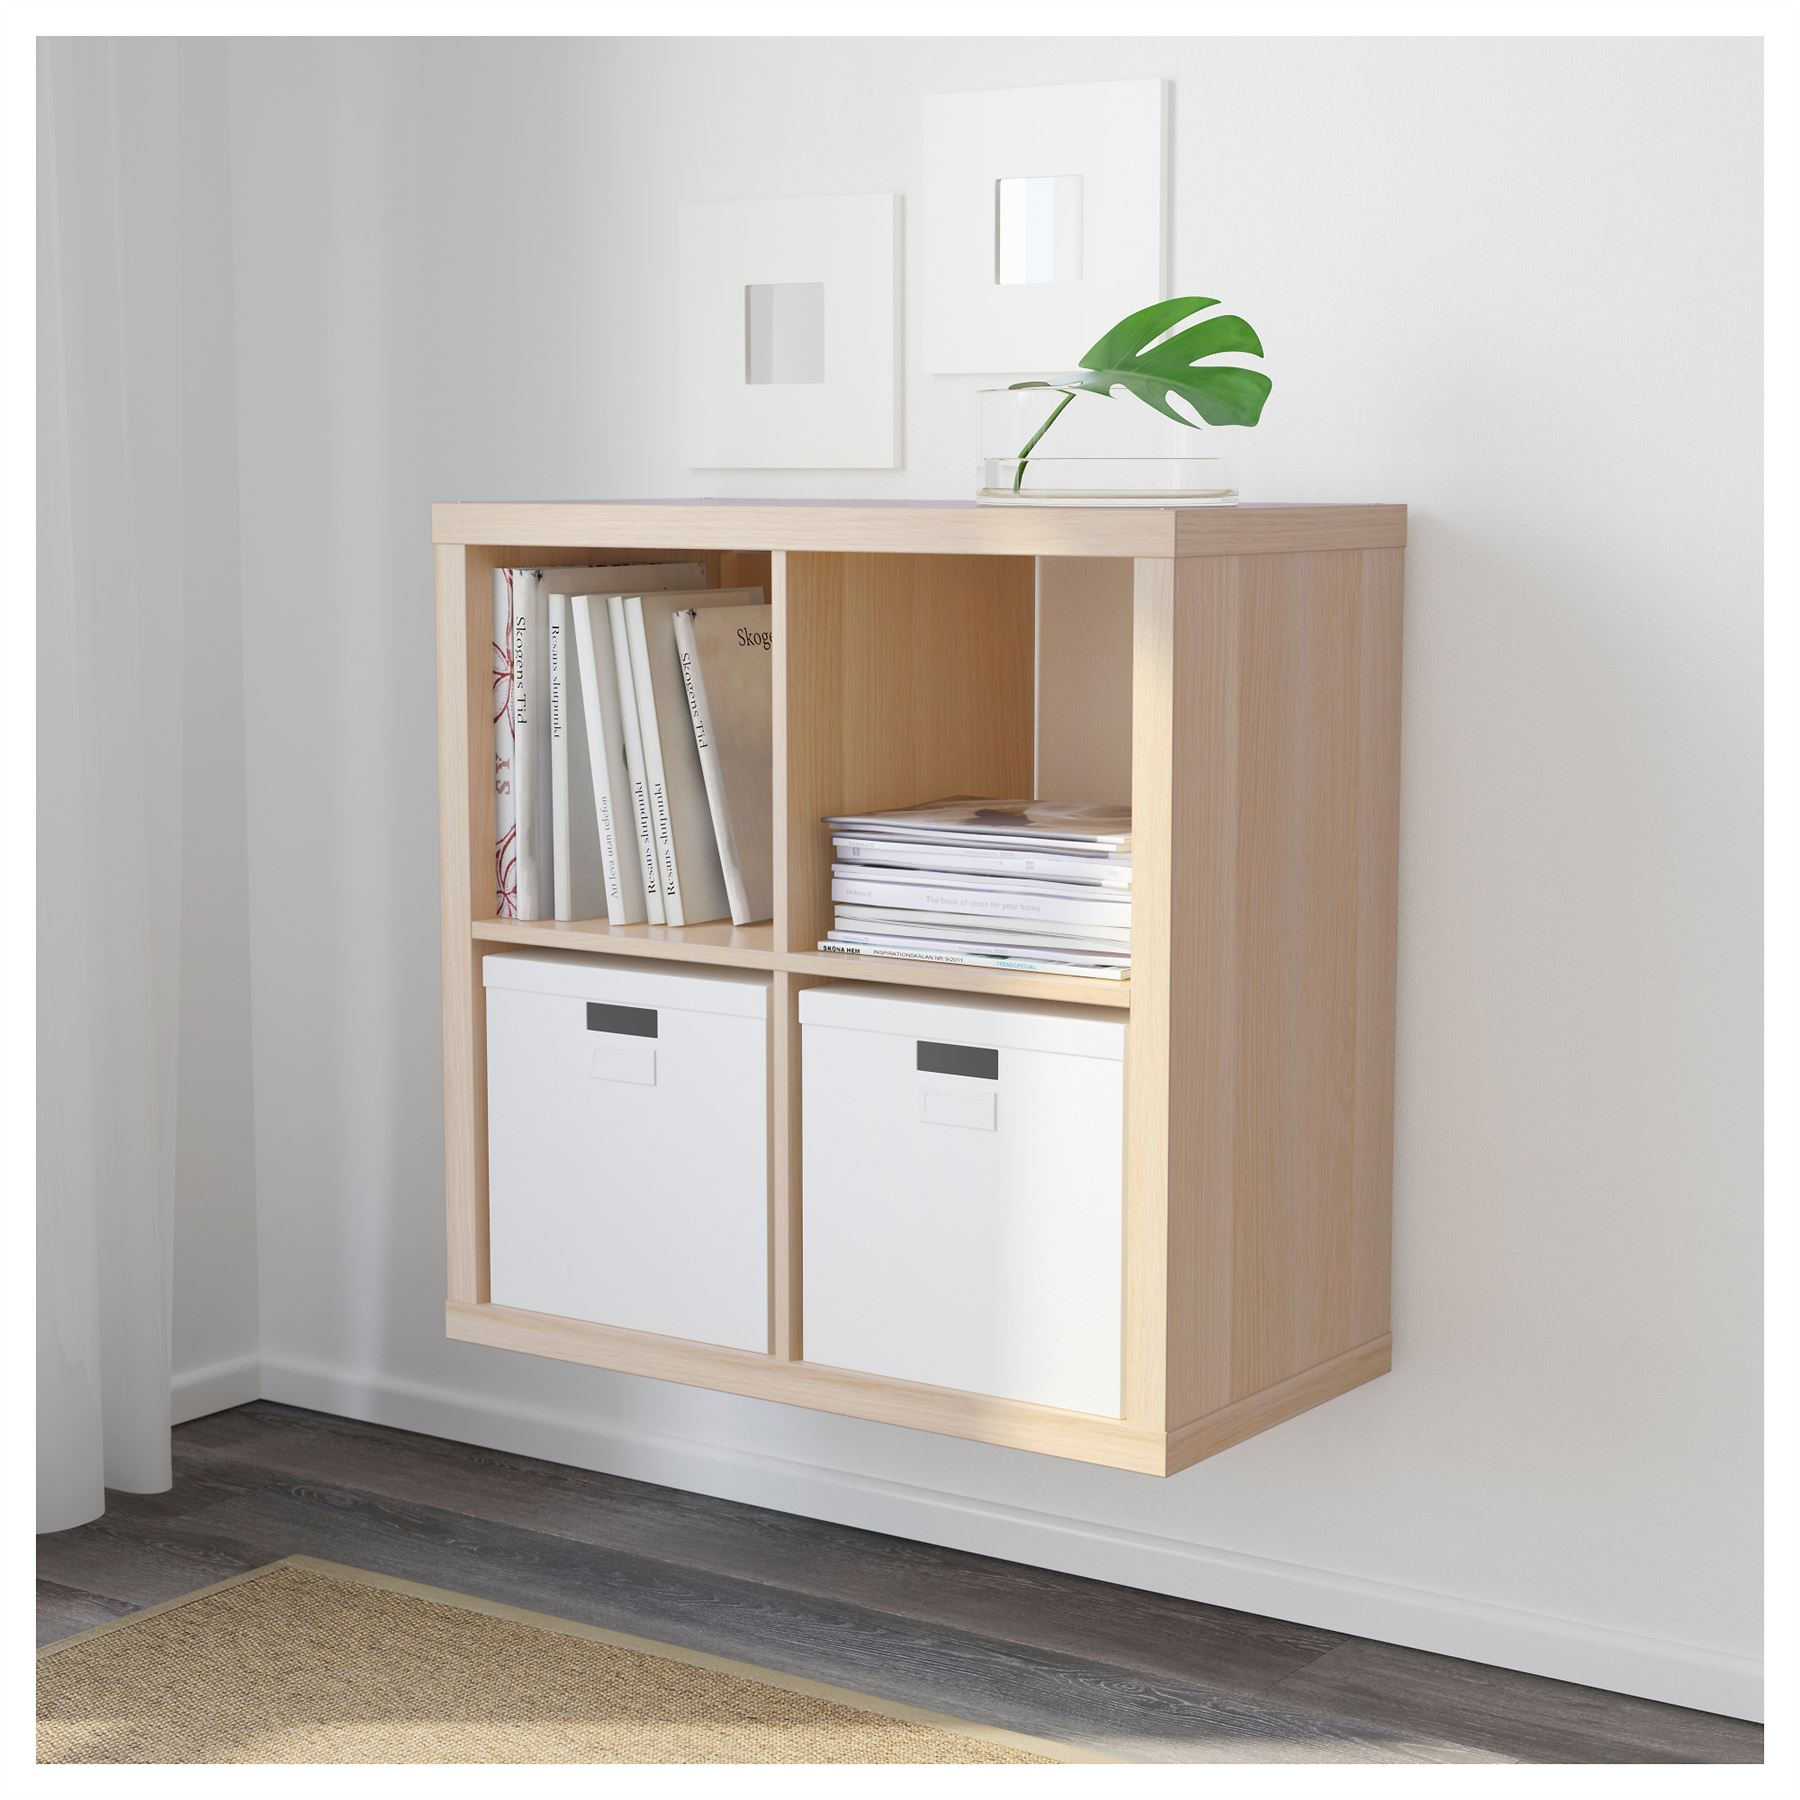 ikea kallax 4 cube storage bookcase square shelving unit. Black Bedroom Furniture Sets. Home Design Ideas